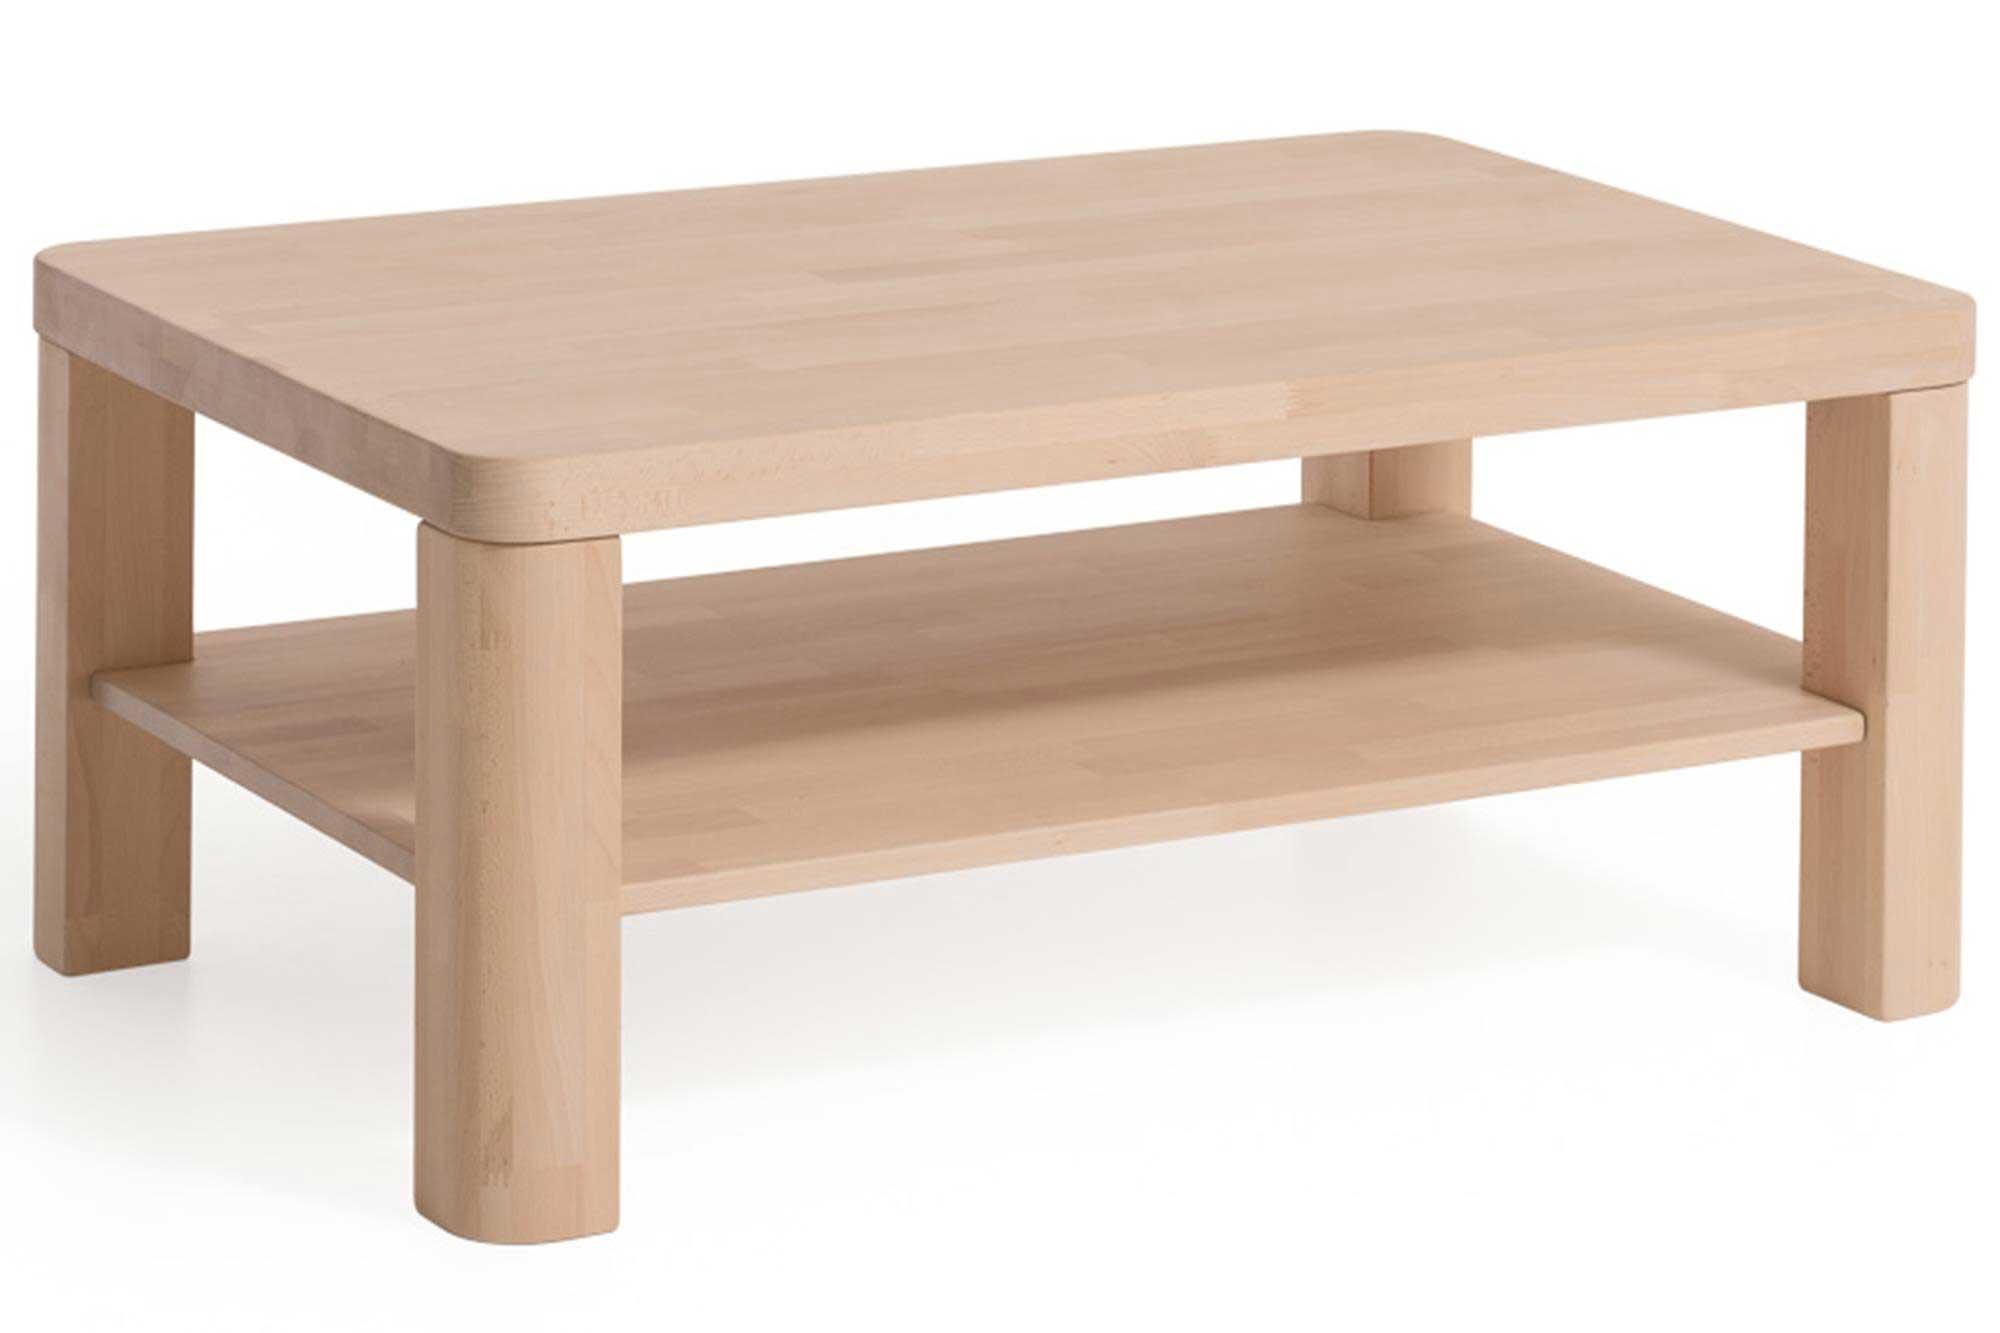 Dico Massivholz Couchtisch buche 110x70 cm